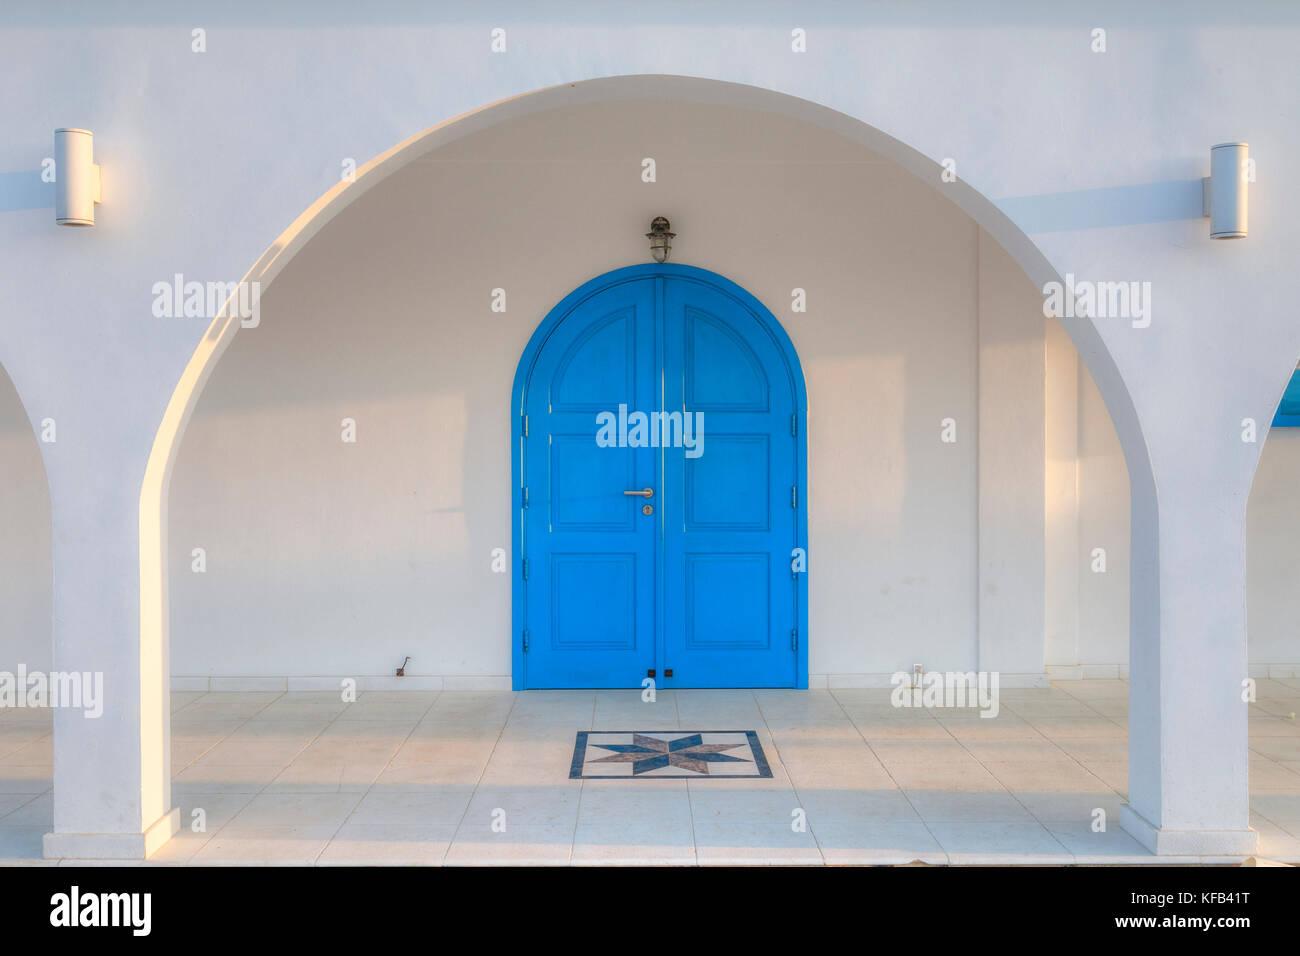 Ayia Thekla Cave Chapel, Sotira, Agia Napa, Cyprus - Stock Image